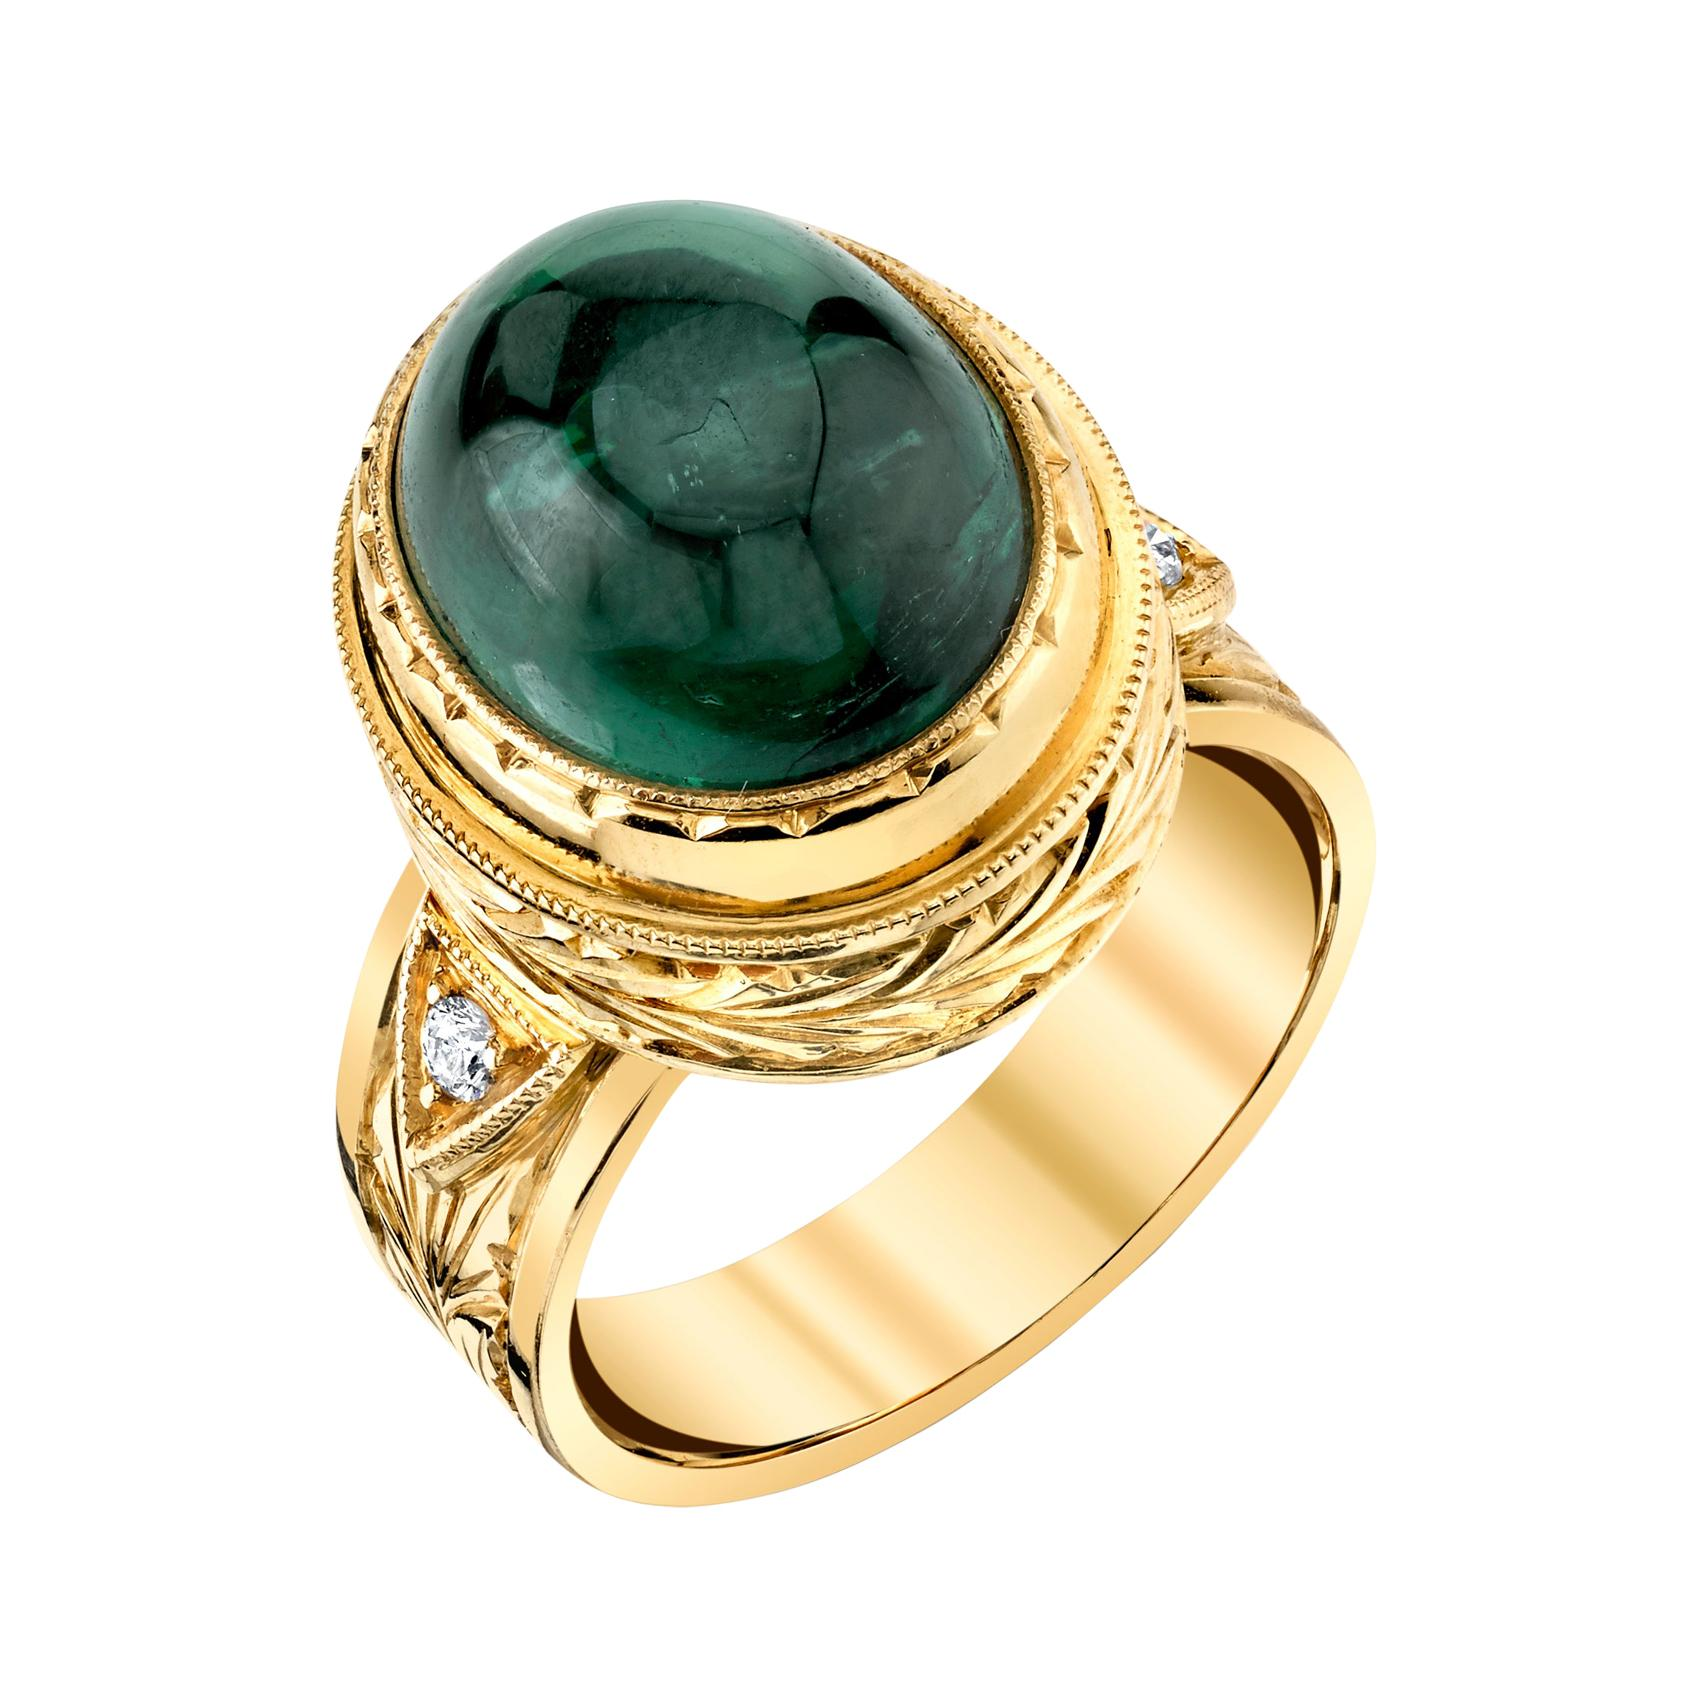 9.80 Carat Green Tourmaline Cabochon Diamond Yellow Gold Bezel Band Dome Ring